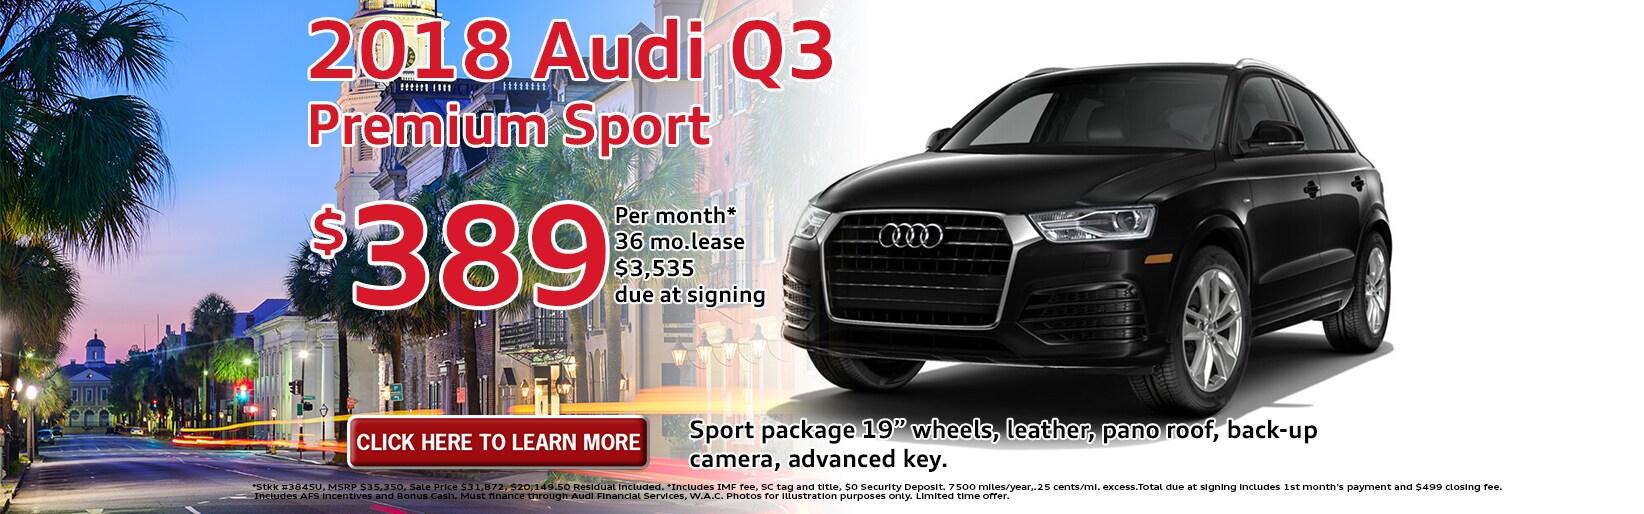 Charleston SC Audi Dealer New Used Audi Sales Specials Audi Service - Audi online payment